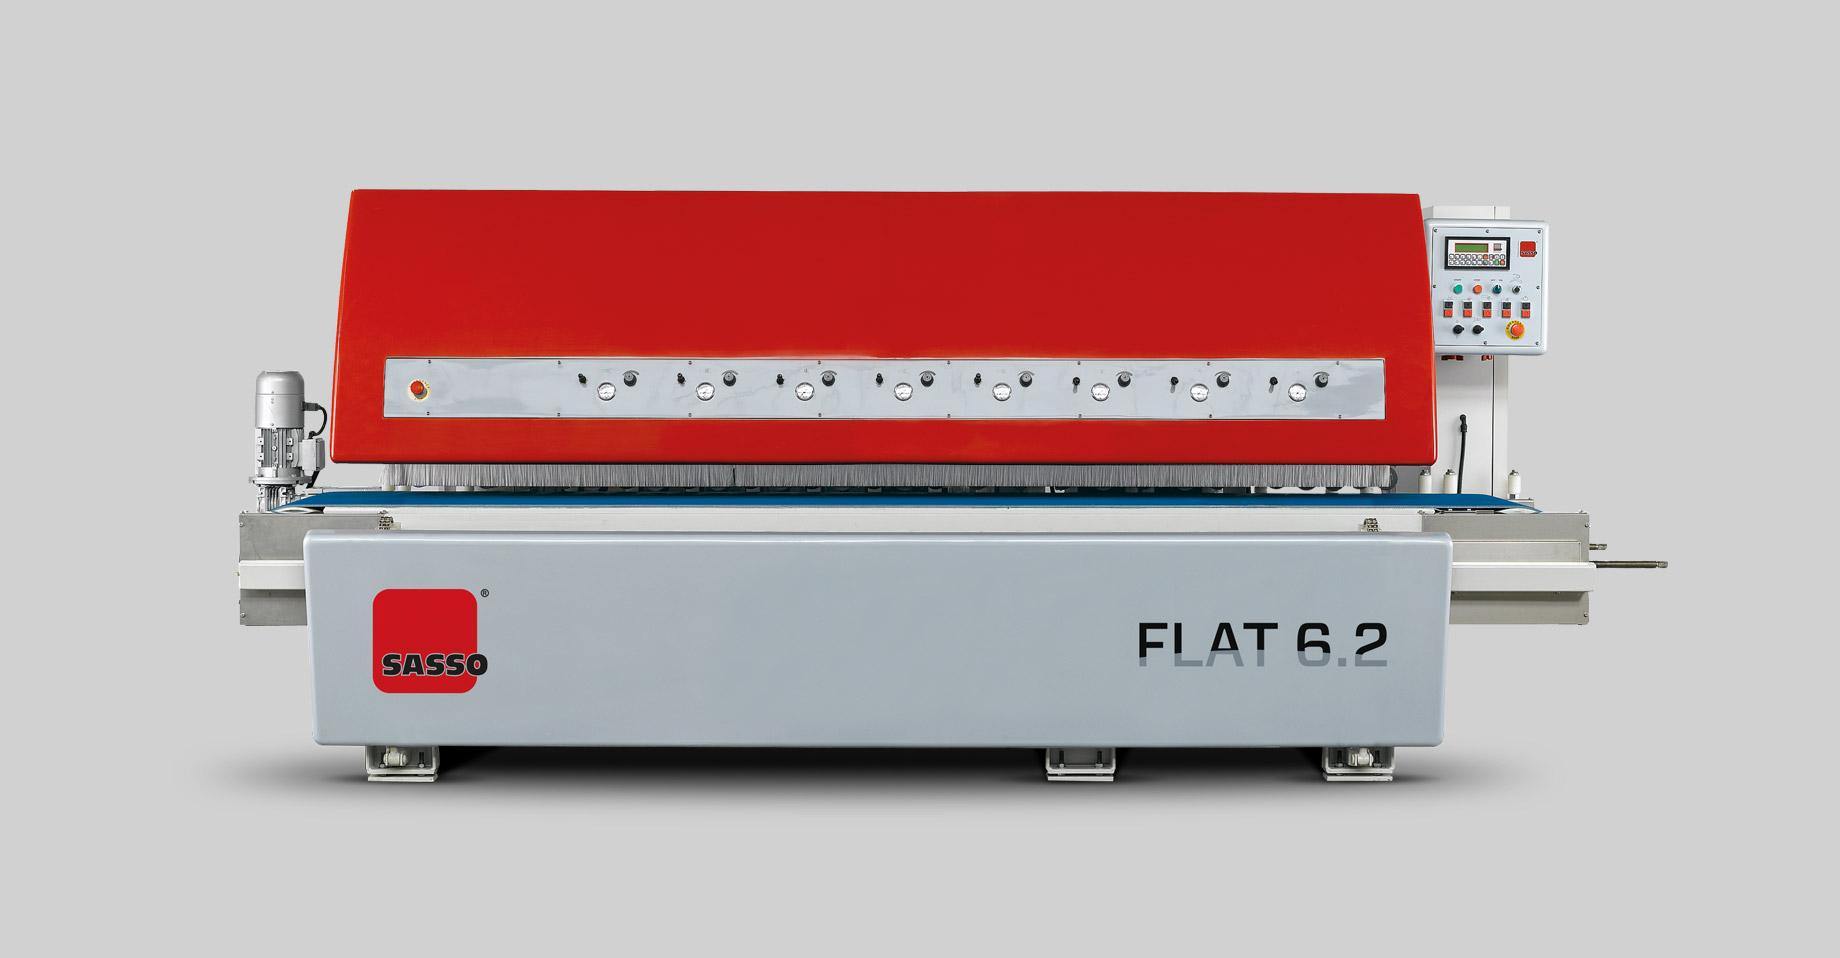 Flat 6.2